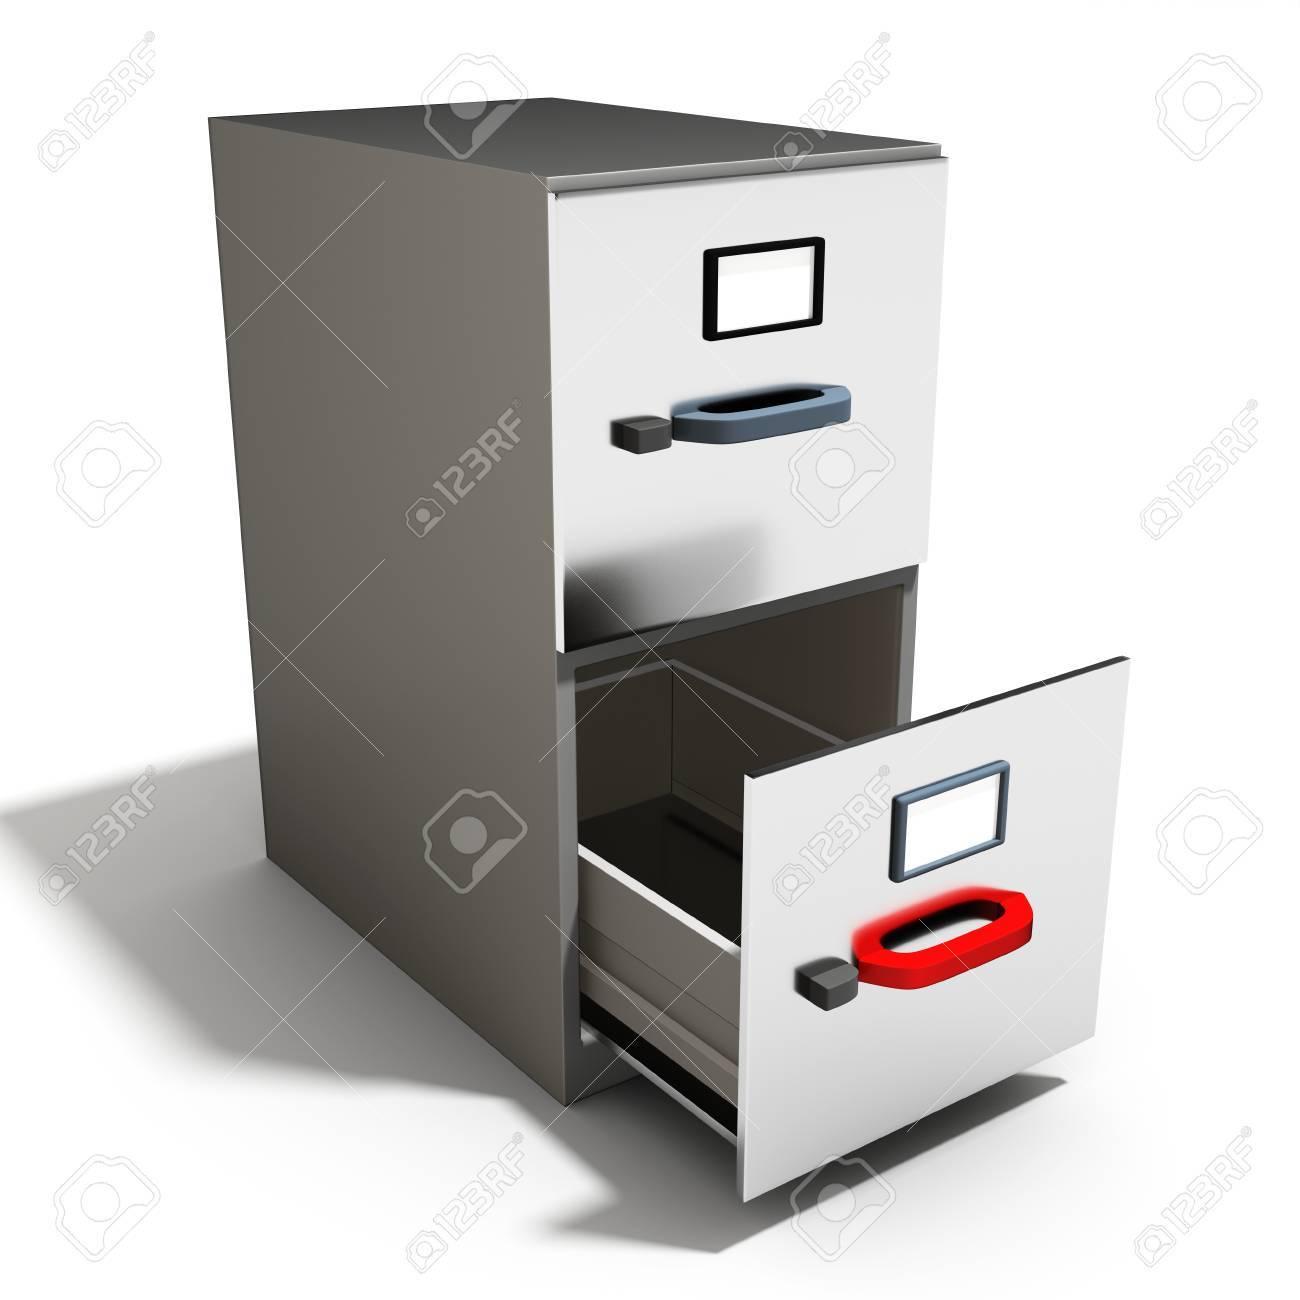 open file cabinet. 3d Empty Open File Cabinet On A White Background Stock Photo - 52151716 E